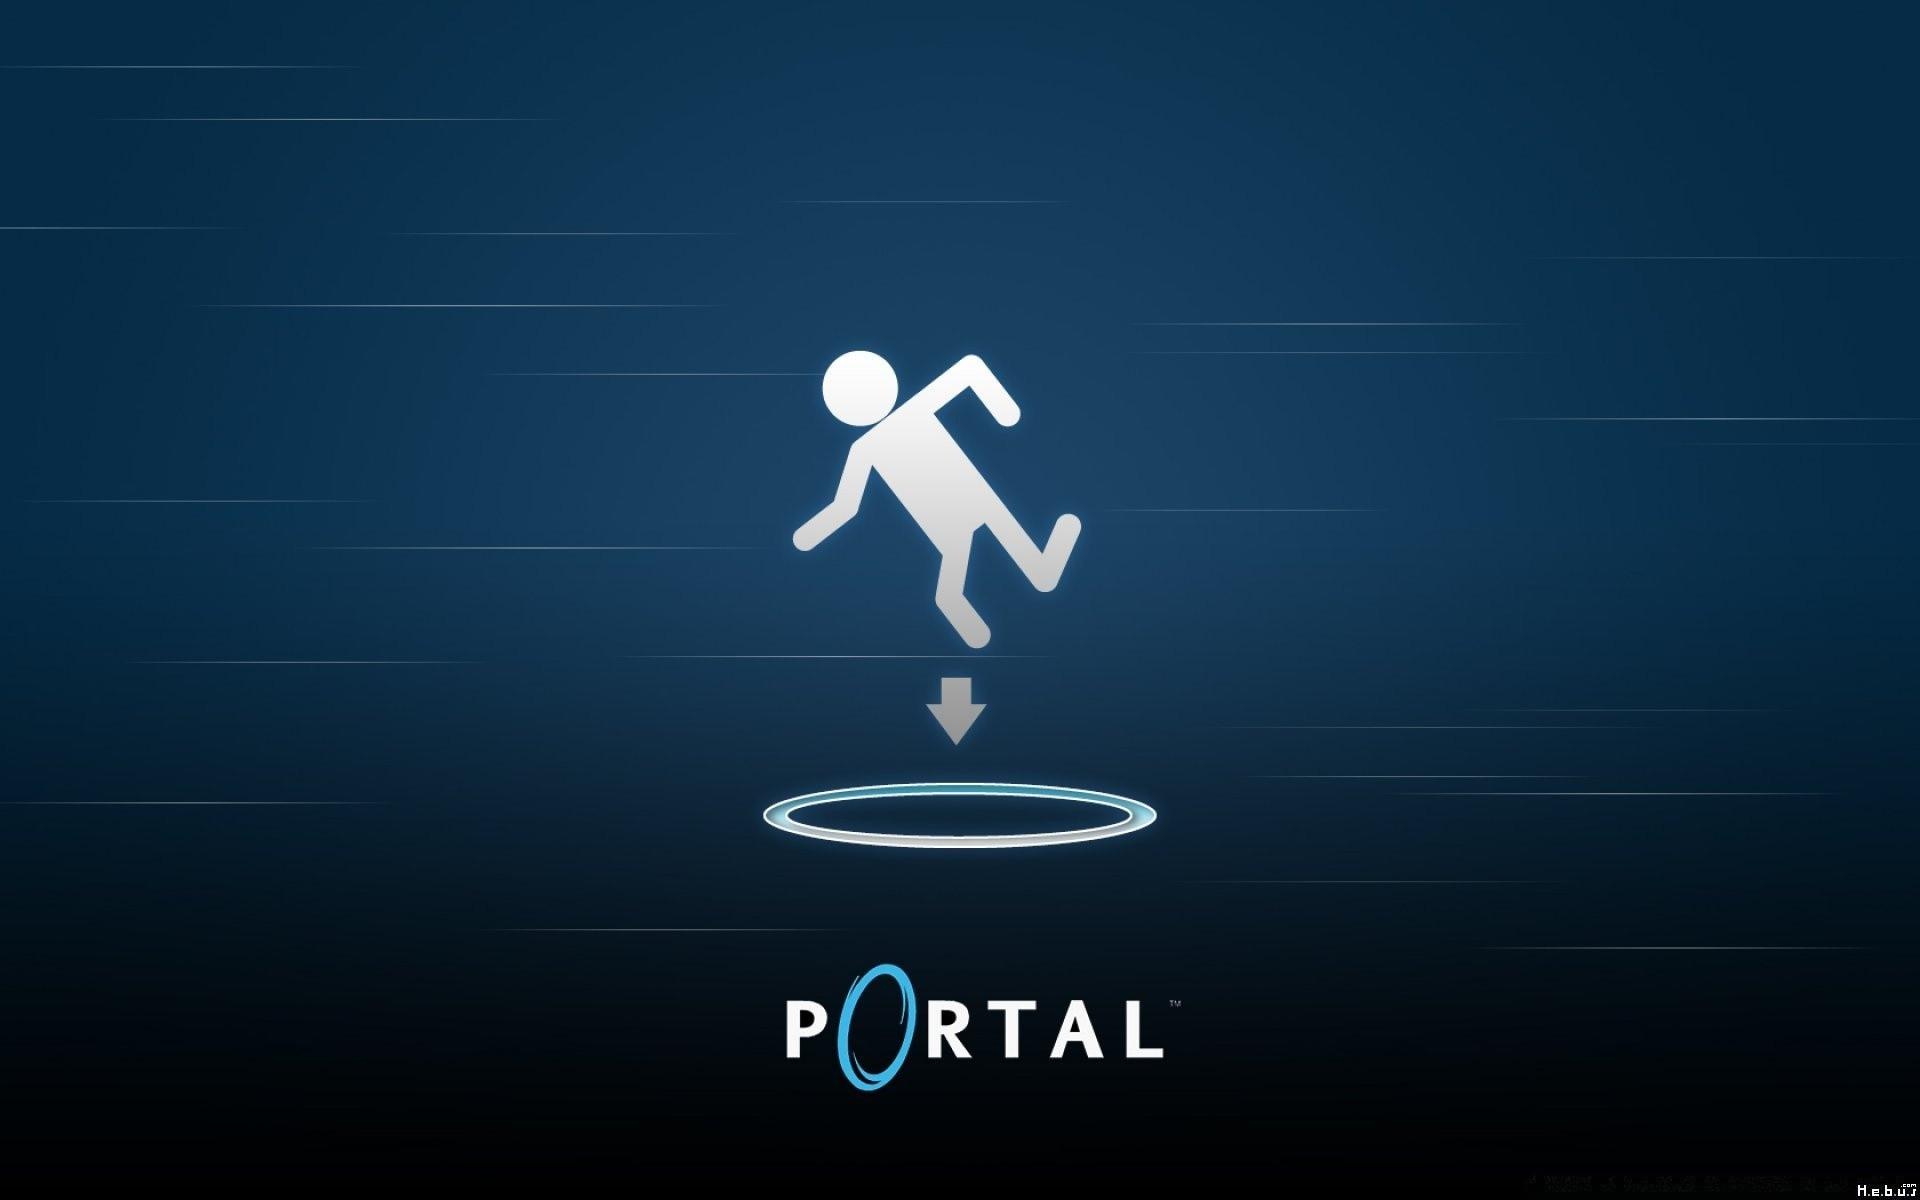 Portal Phone Wallpapers